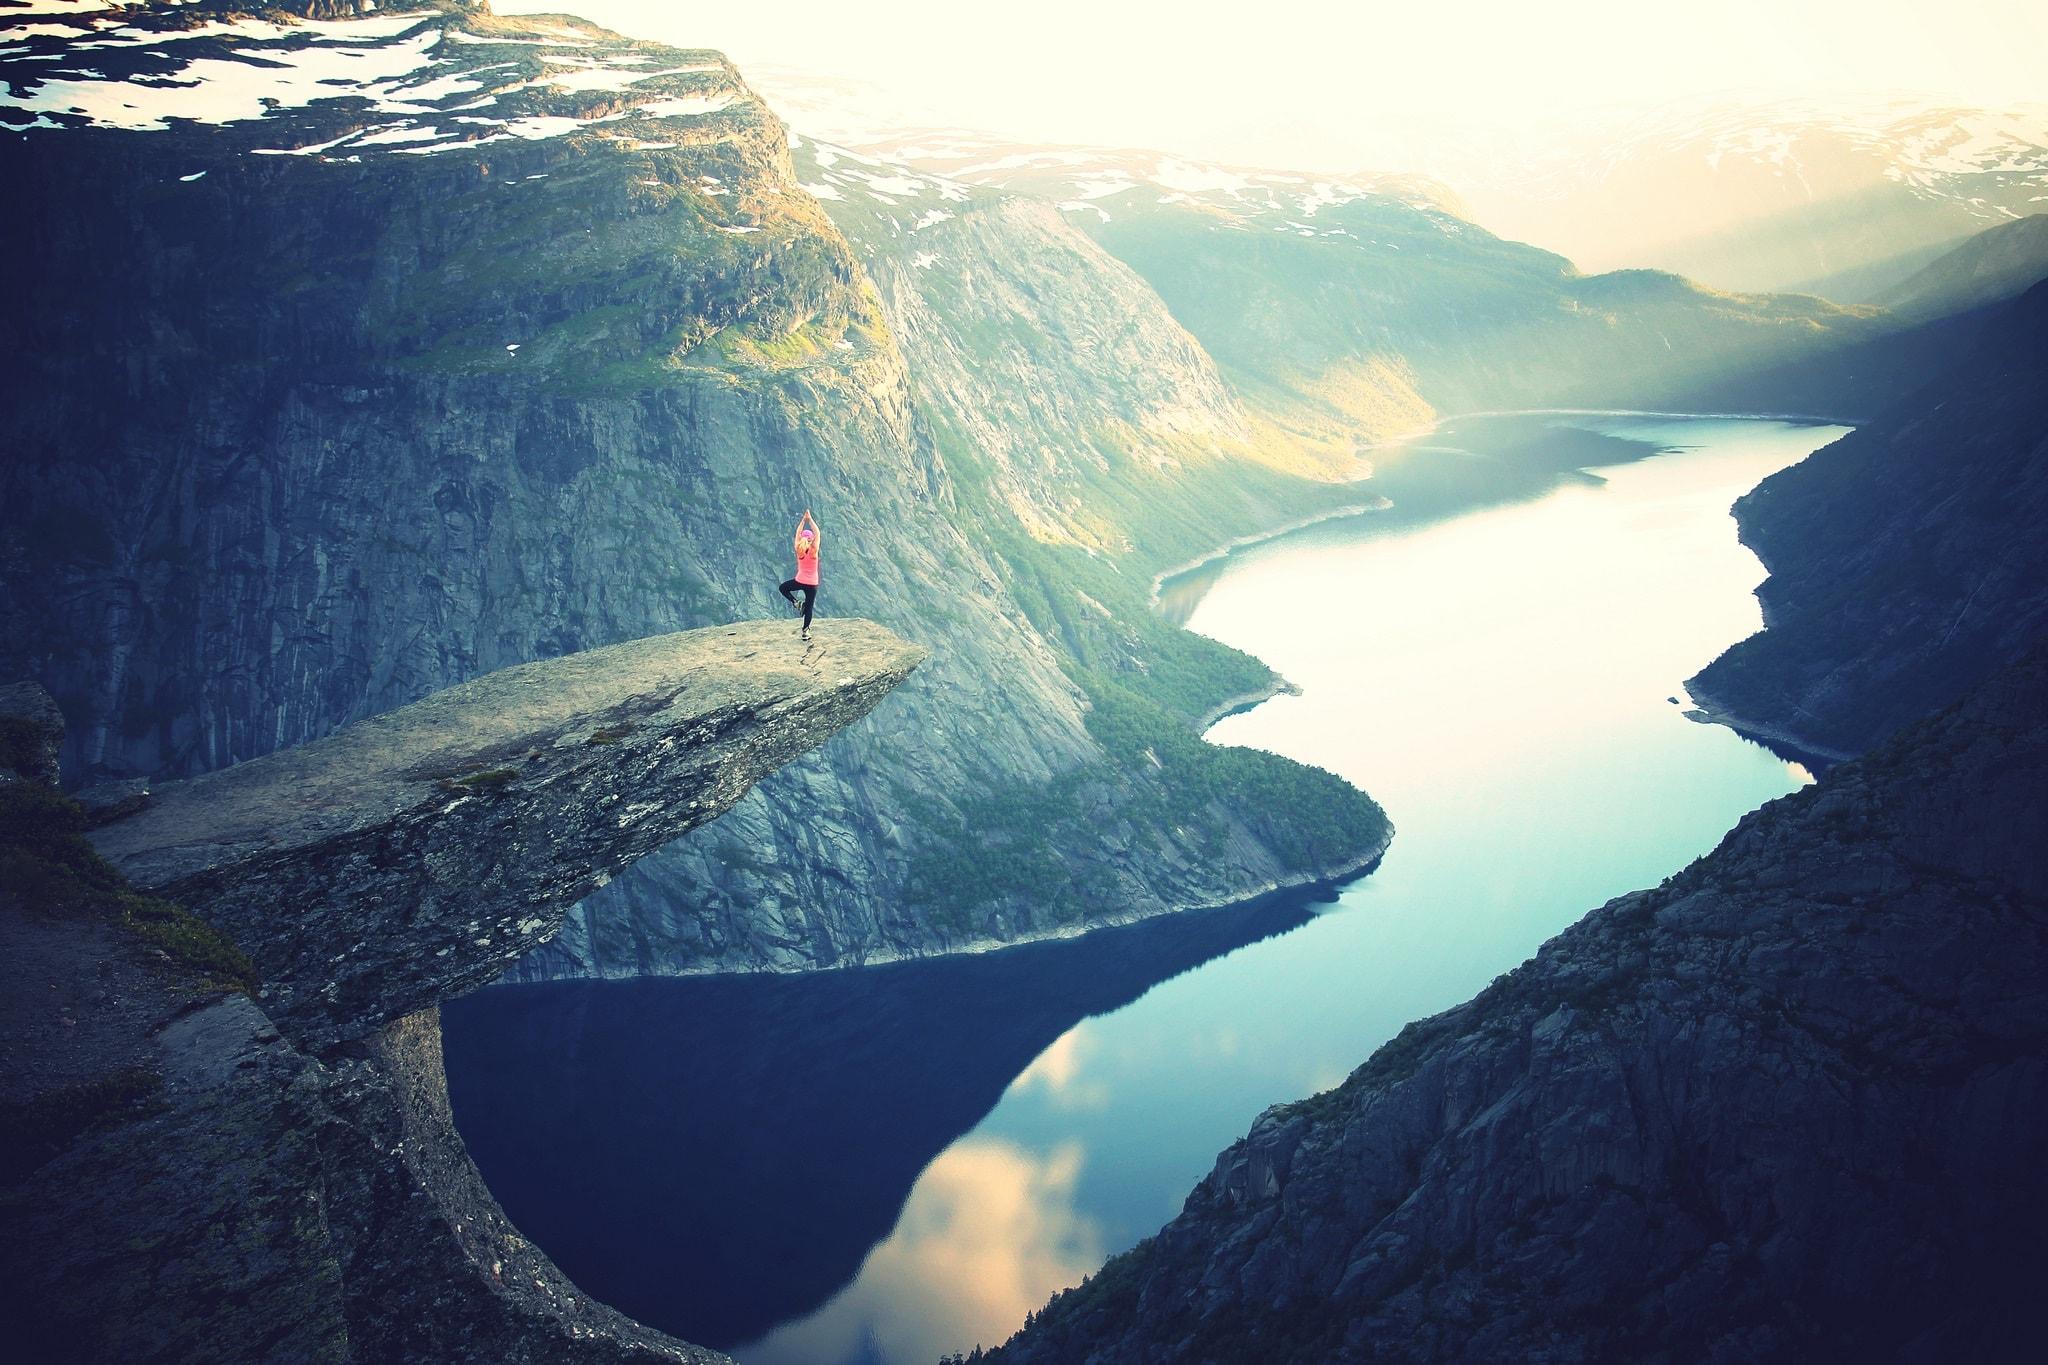 voyage-norvege-points-de-vue-trolltunga-julia-caesar